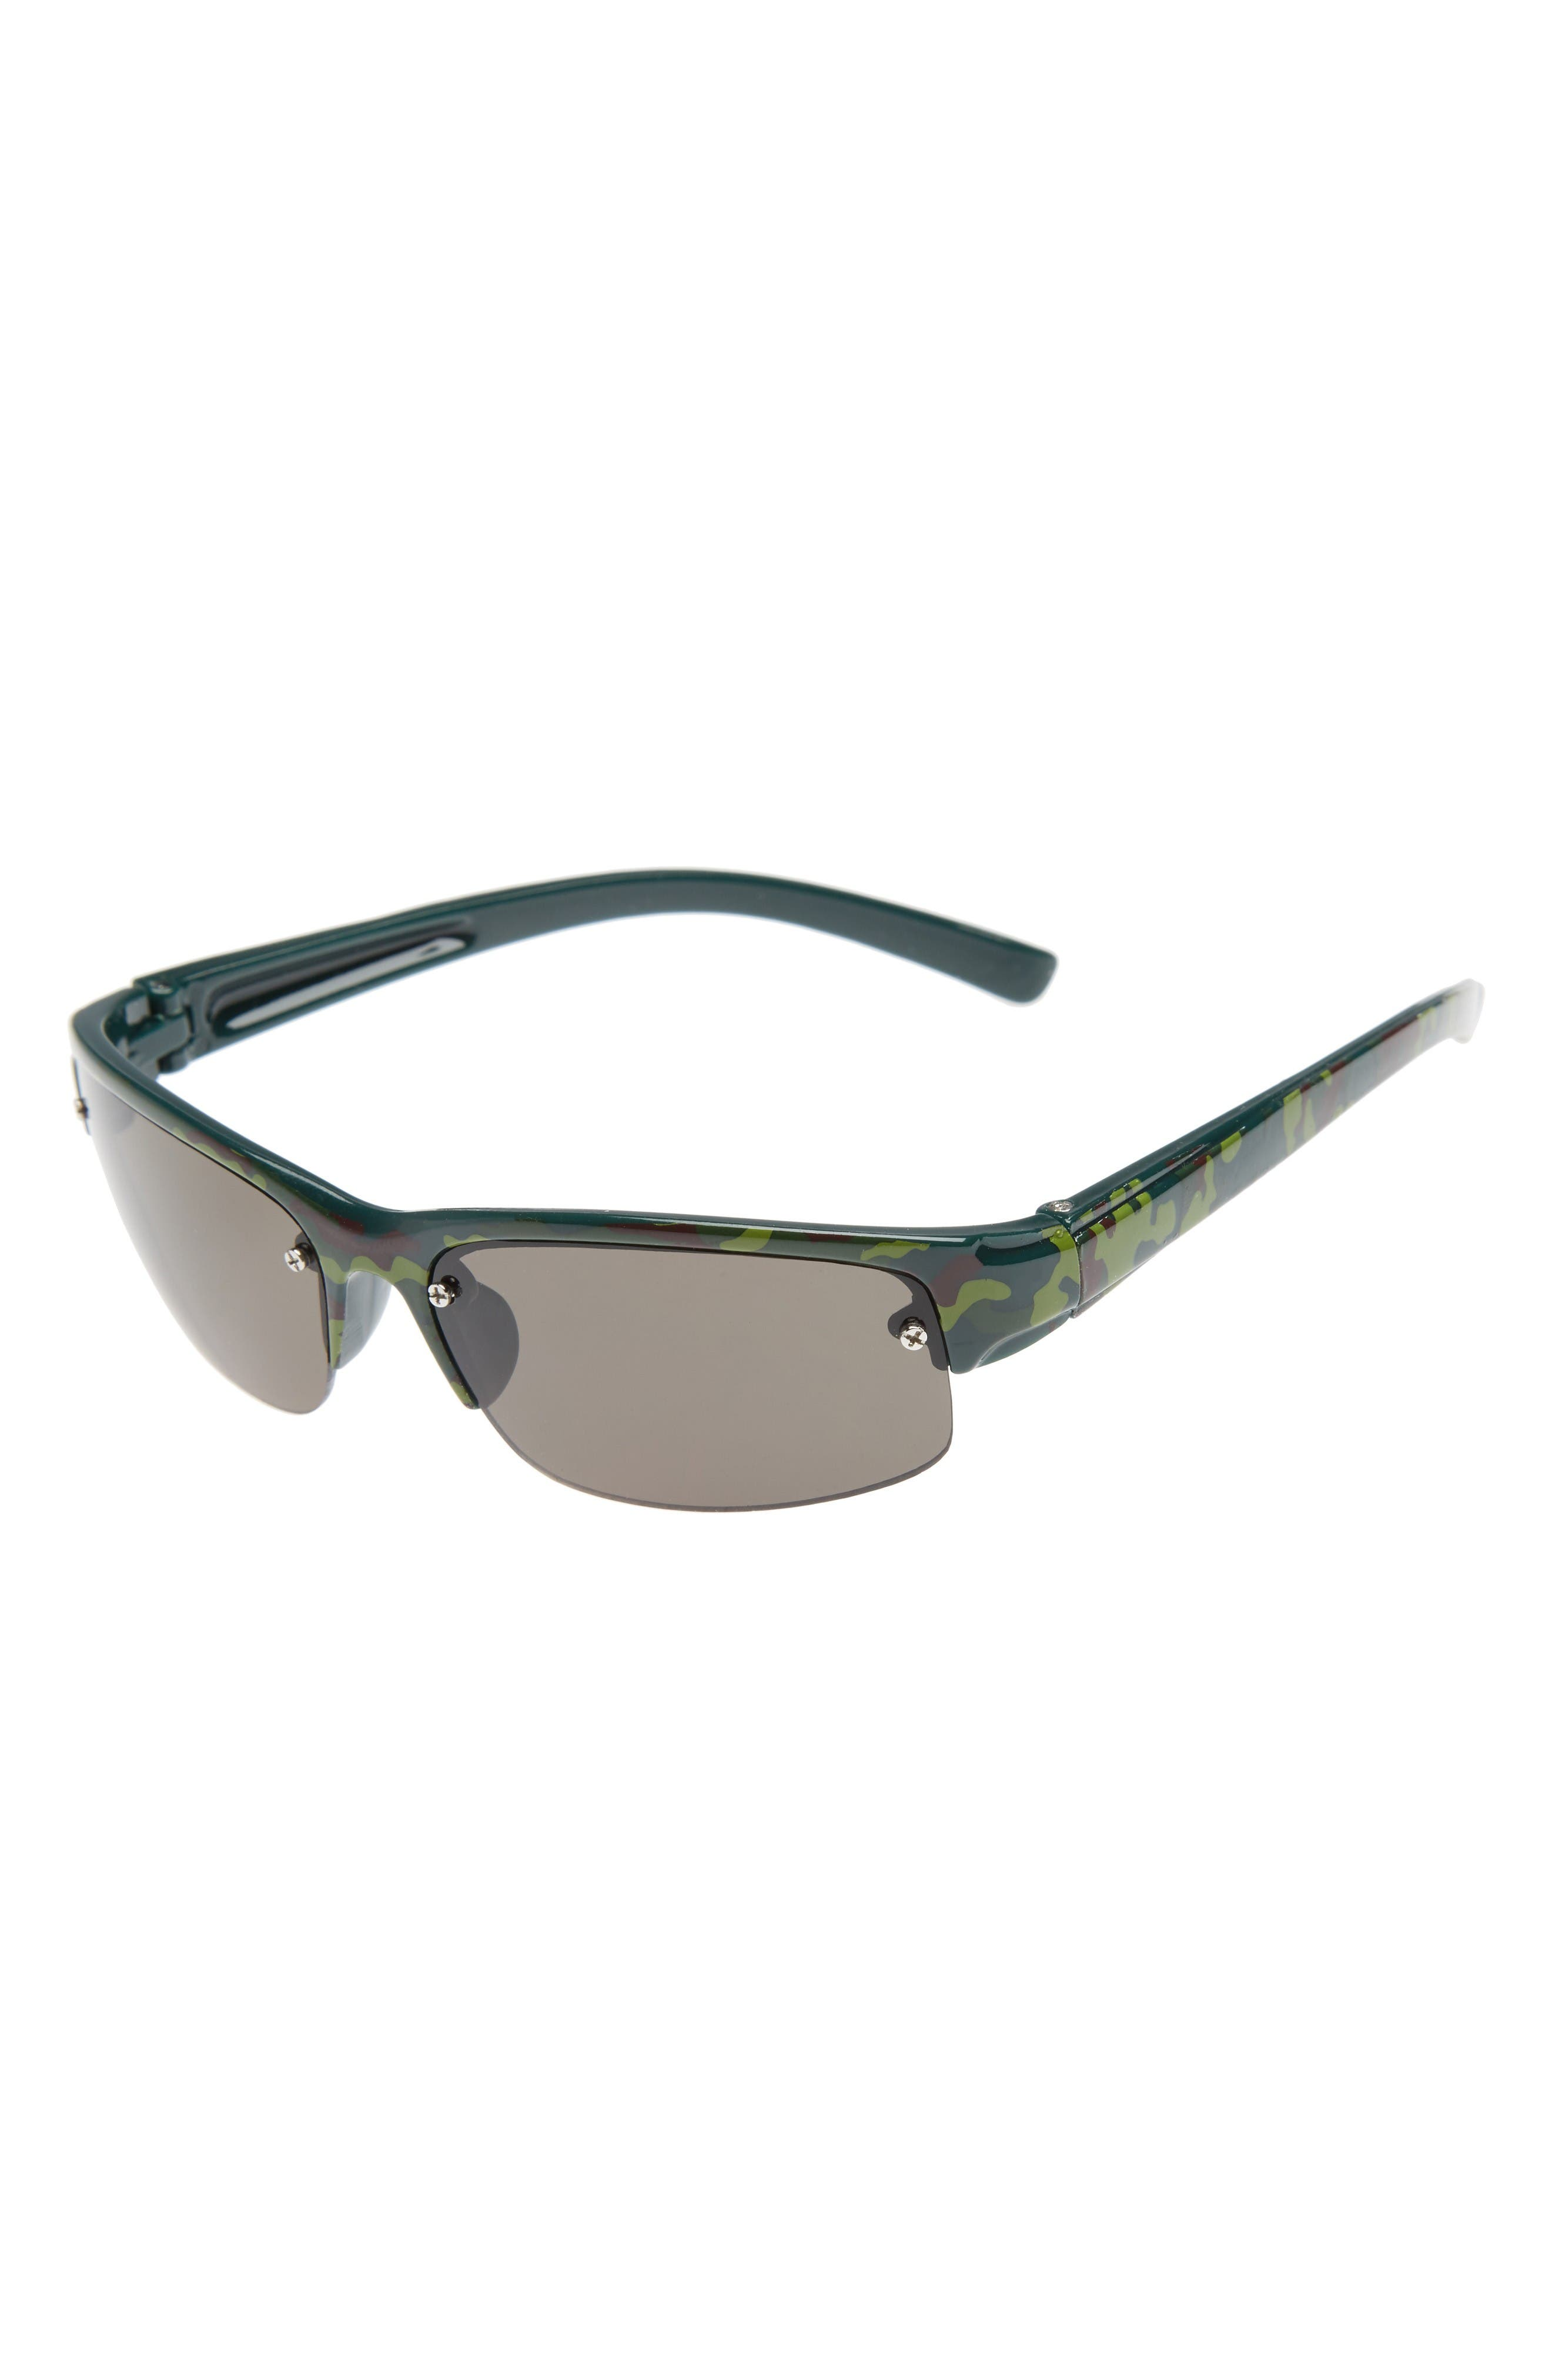 FANTAS EYES Camo Semi Rimless Wrap Sunglasses